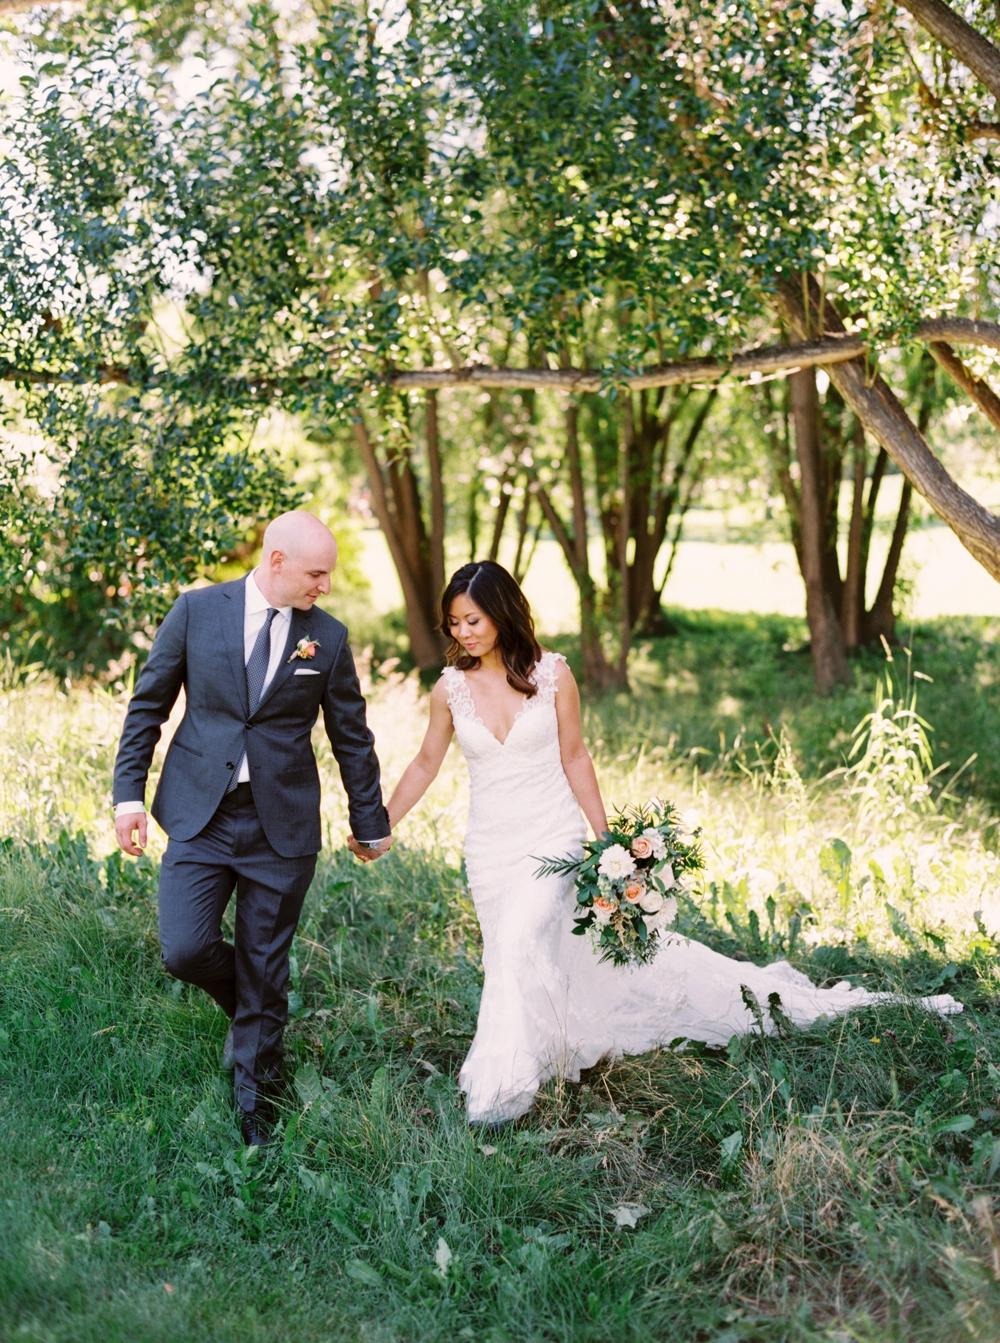 Calgary Wedding Photographer | Meadow Muse Pavilion Wedding | Canmore Photographers | Fish Creek Park | Tent Wedding